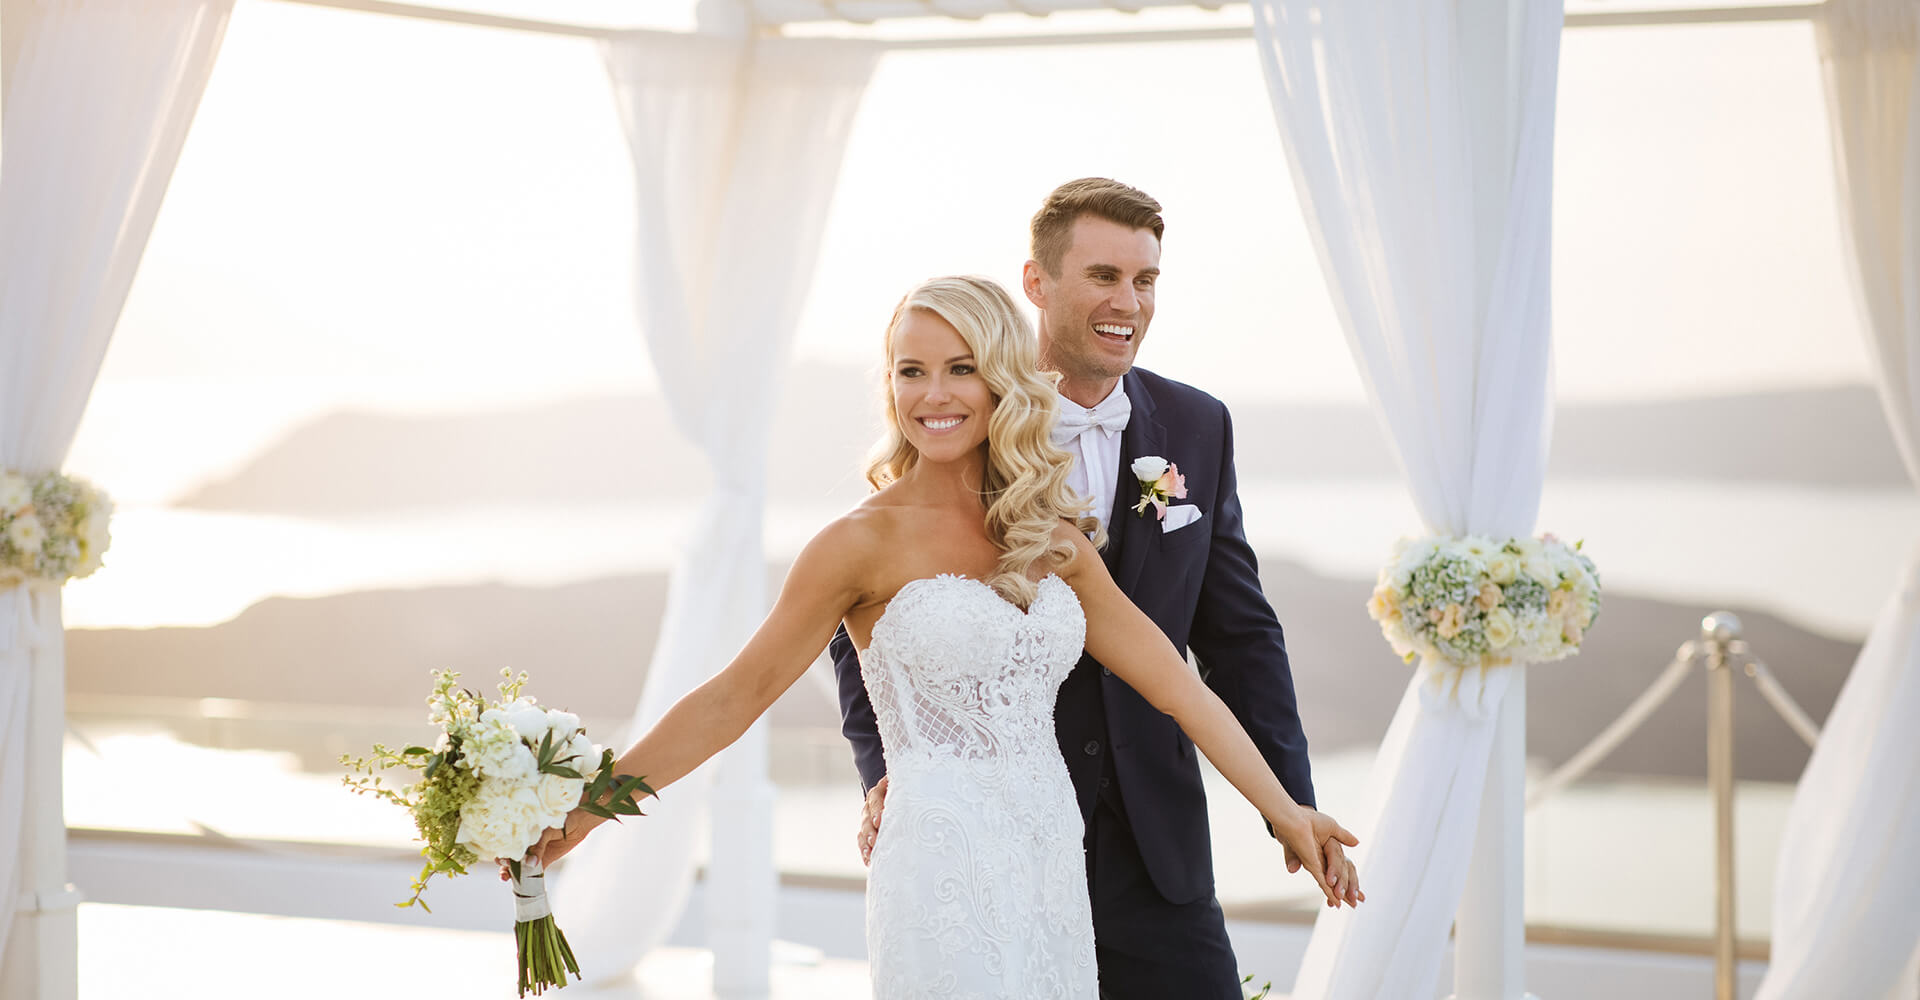 Caldera Ceremony - Wedding Venue - Santorini Gem